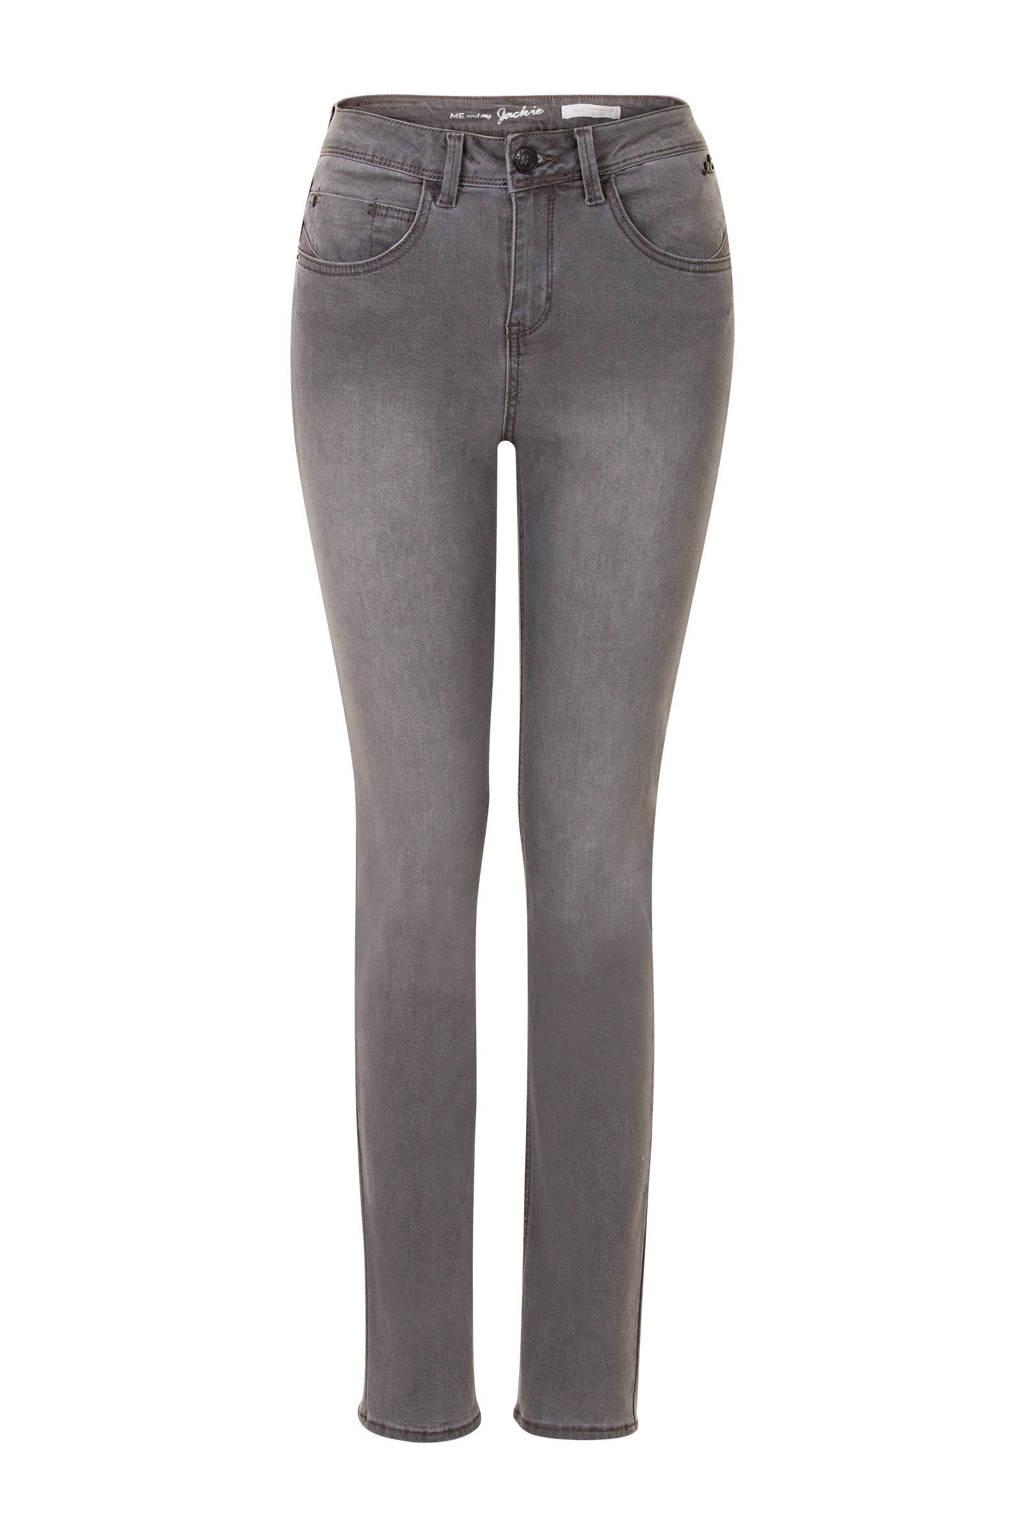 Miss Etam Regulier  straight fit jeans Jackie 32 inch grijs, Grijs